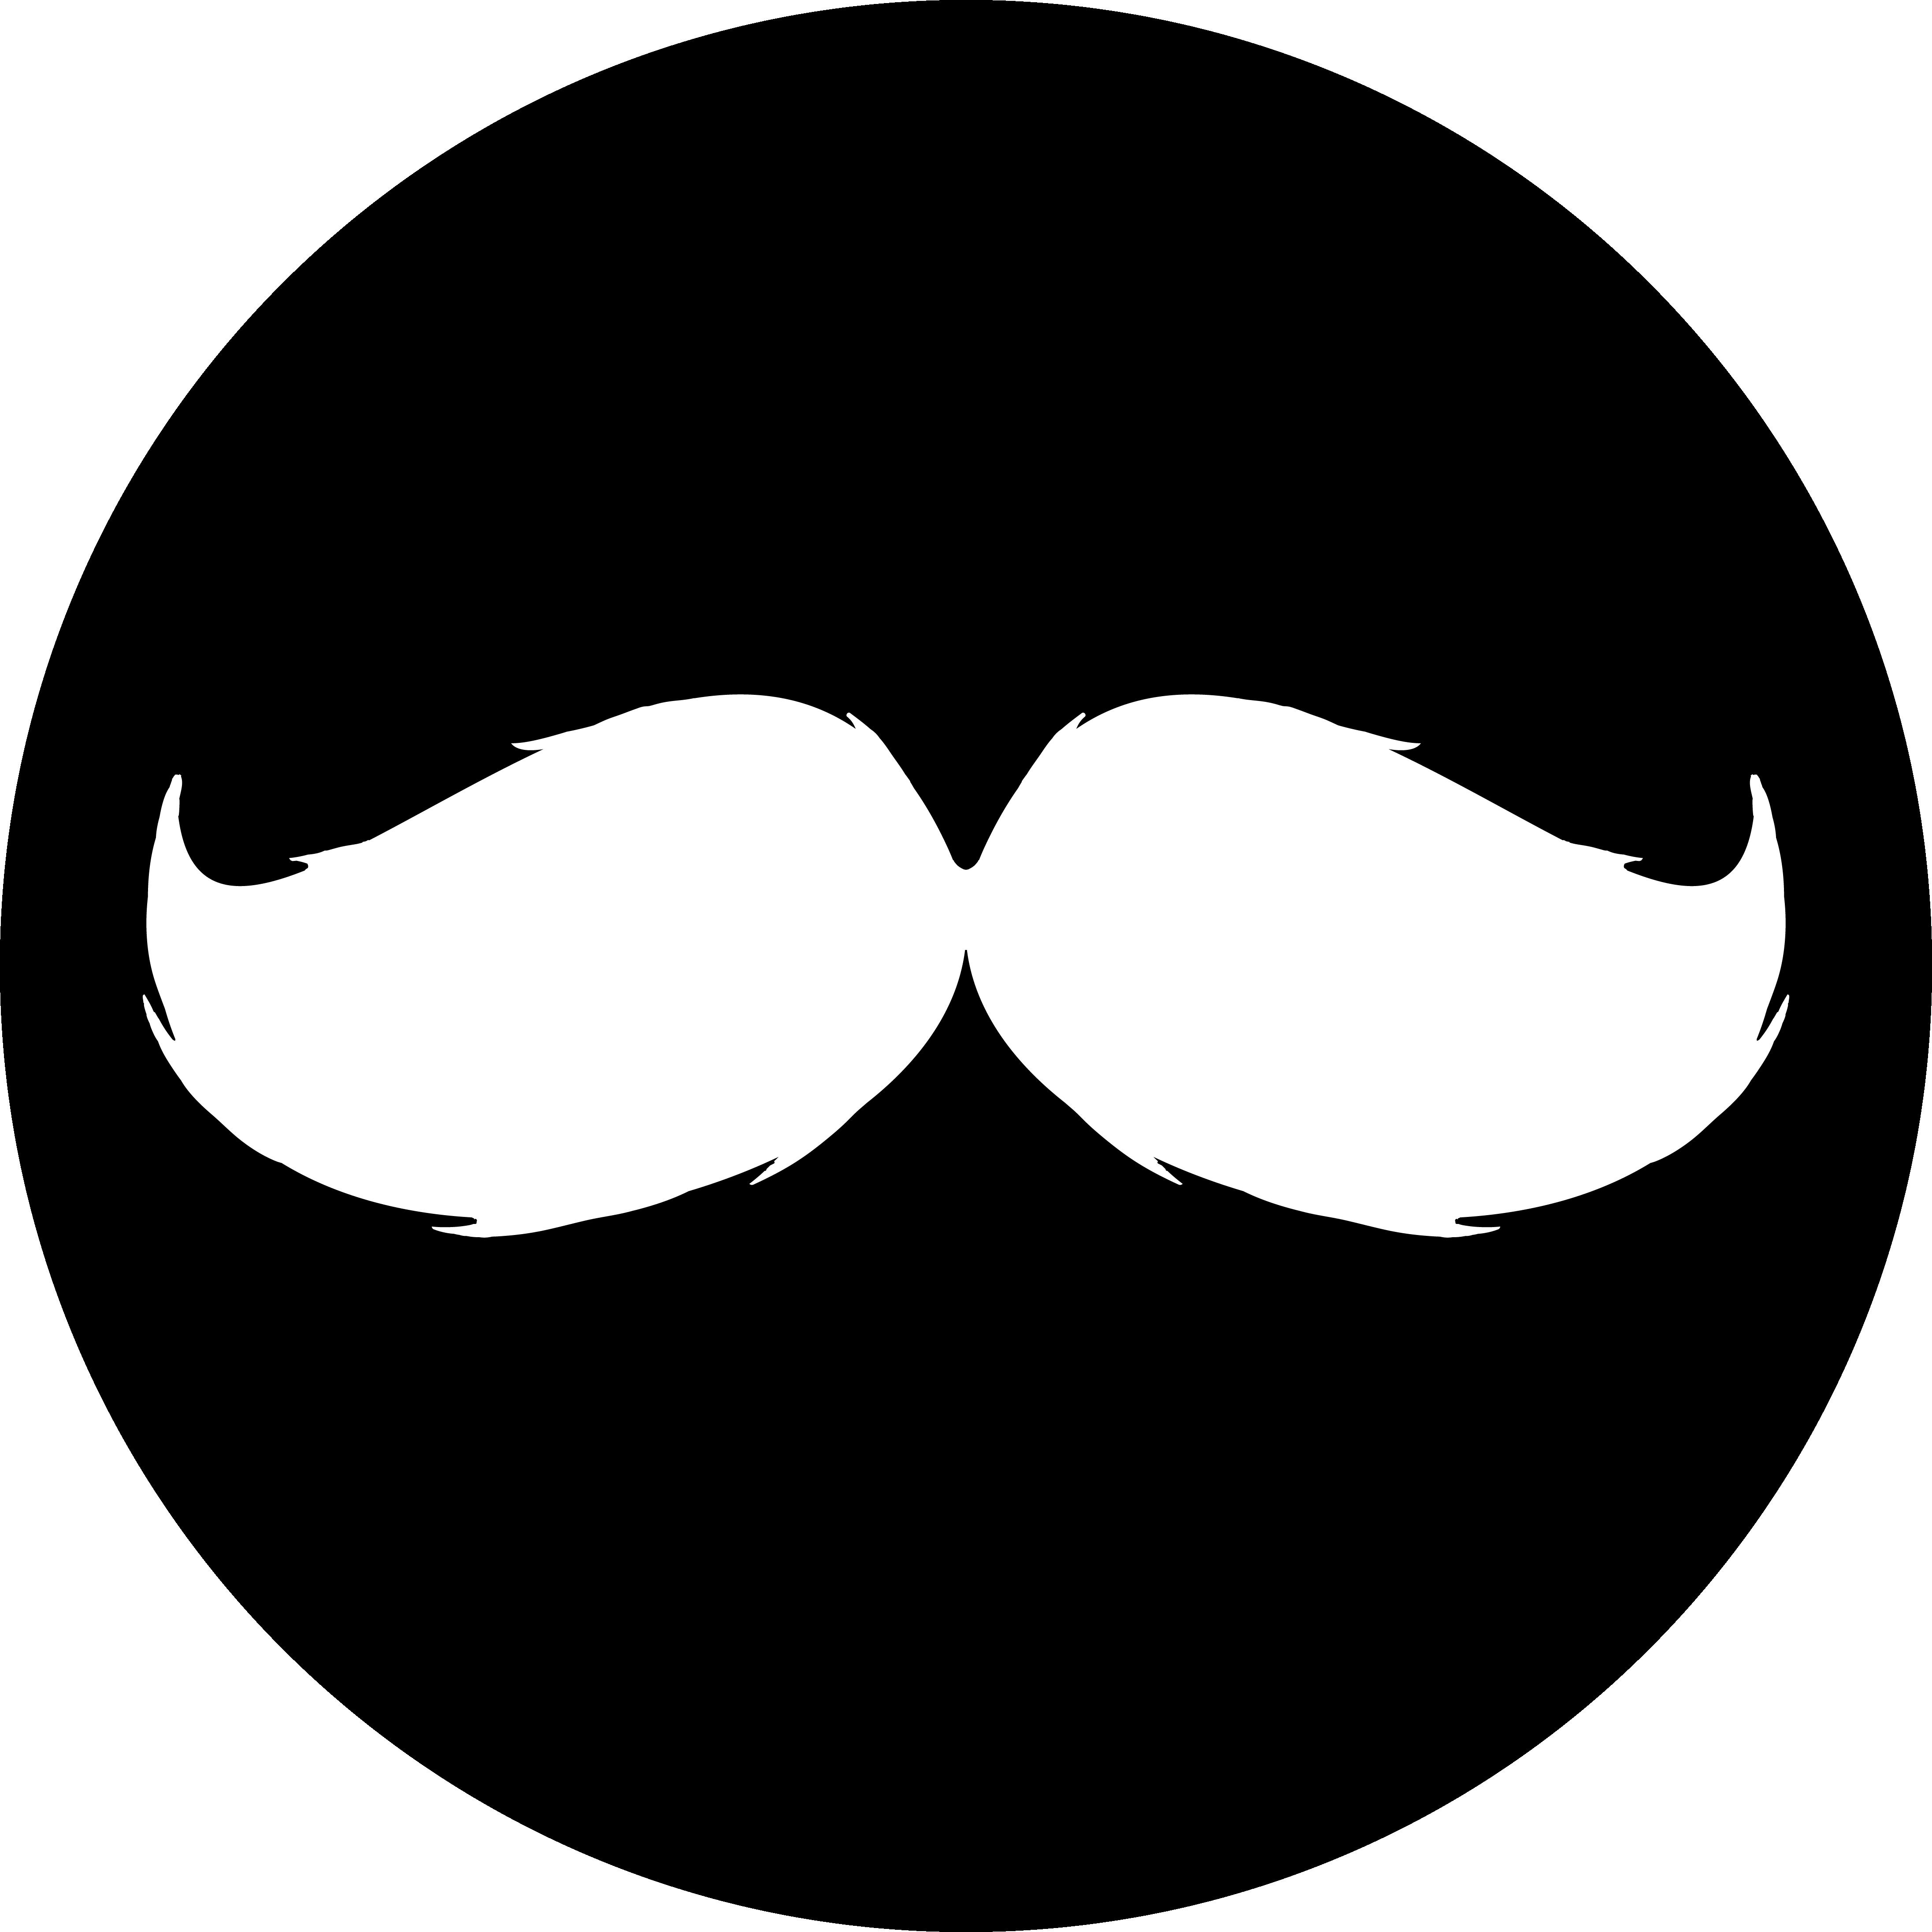 Milk Mustache logo